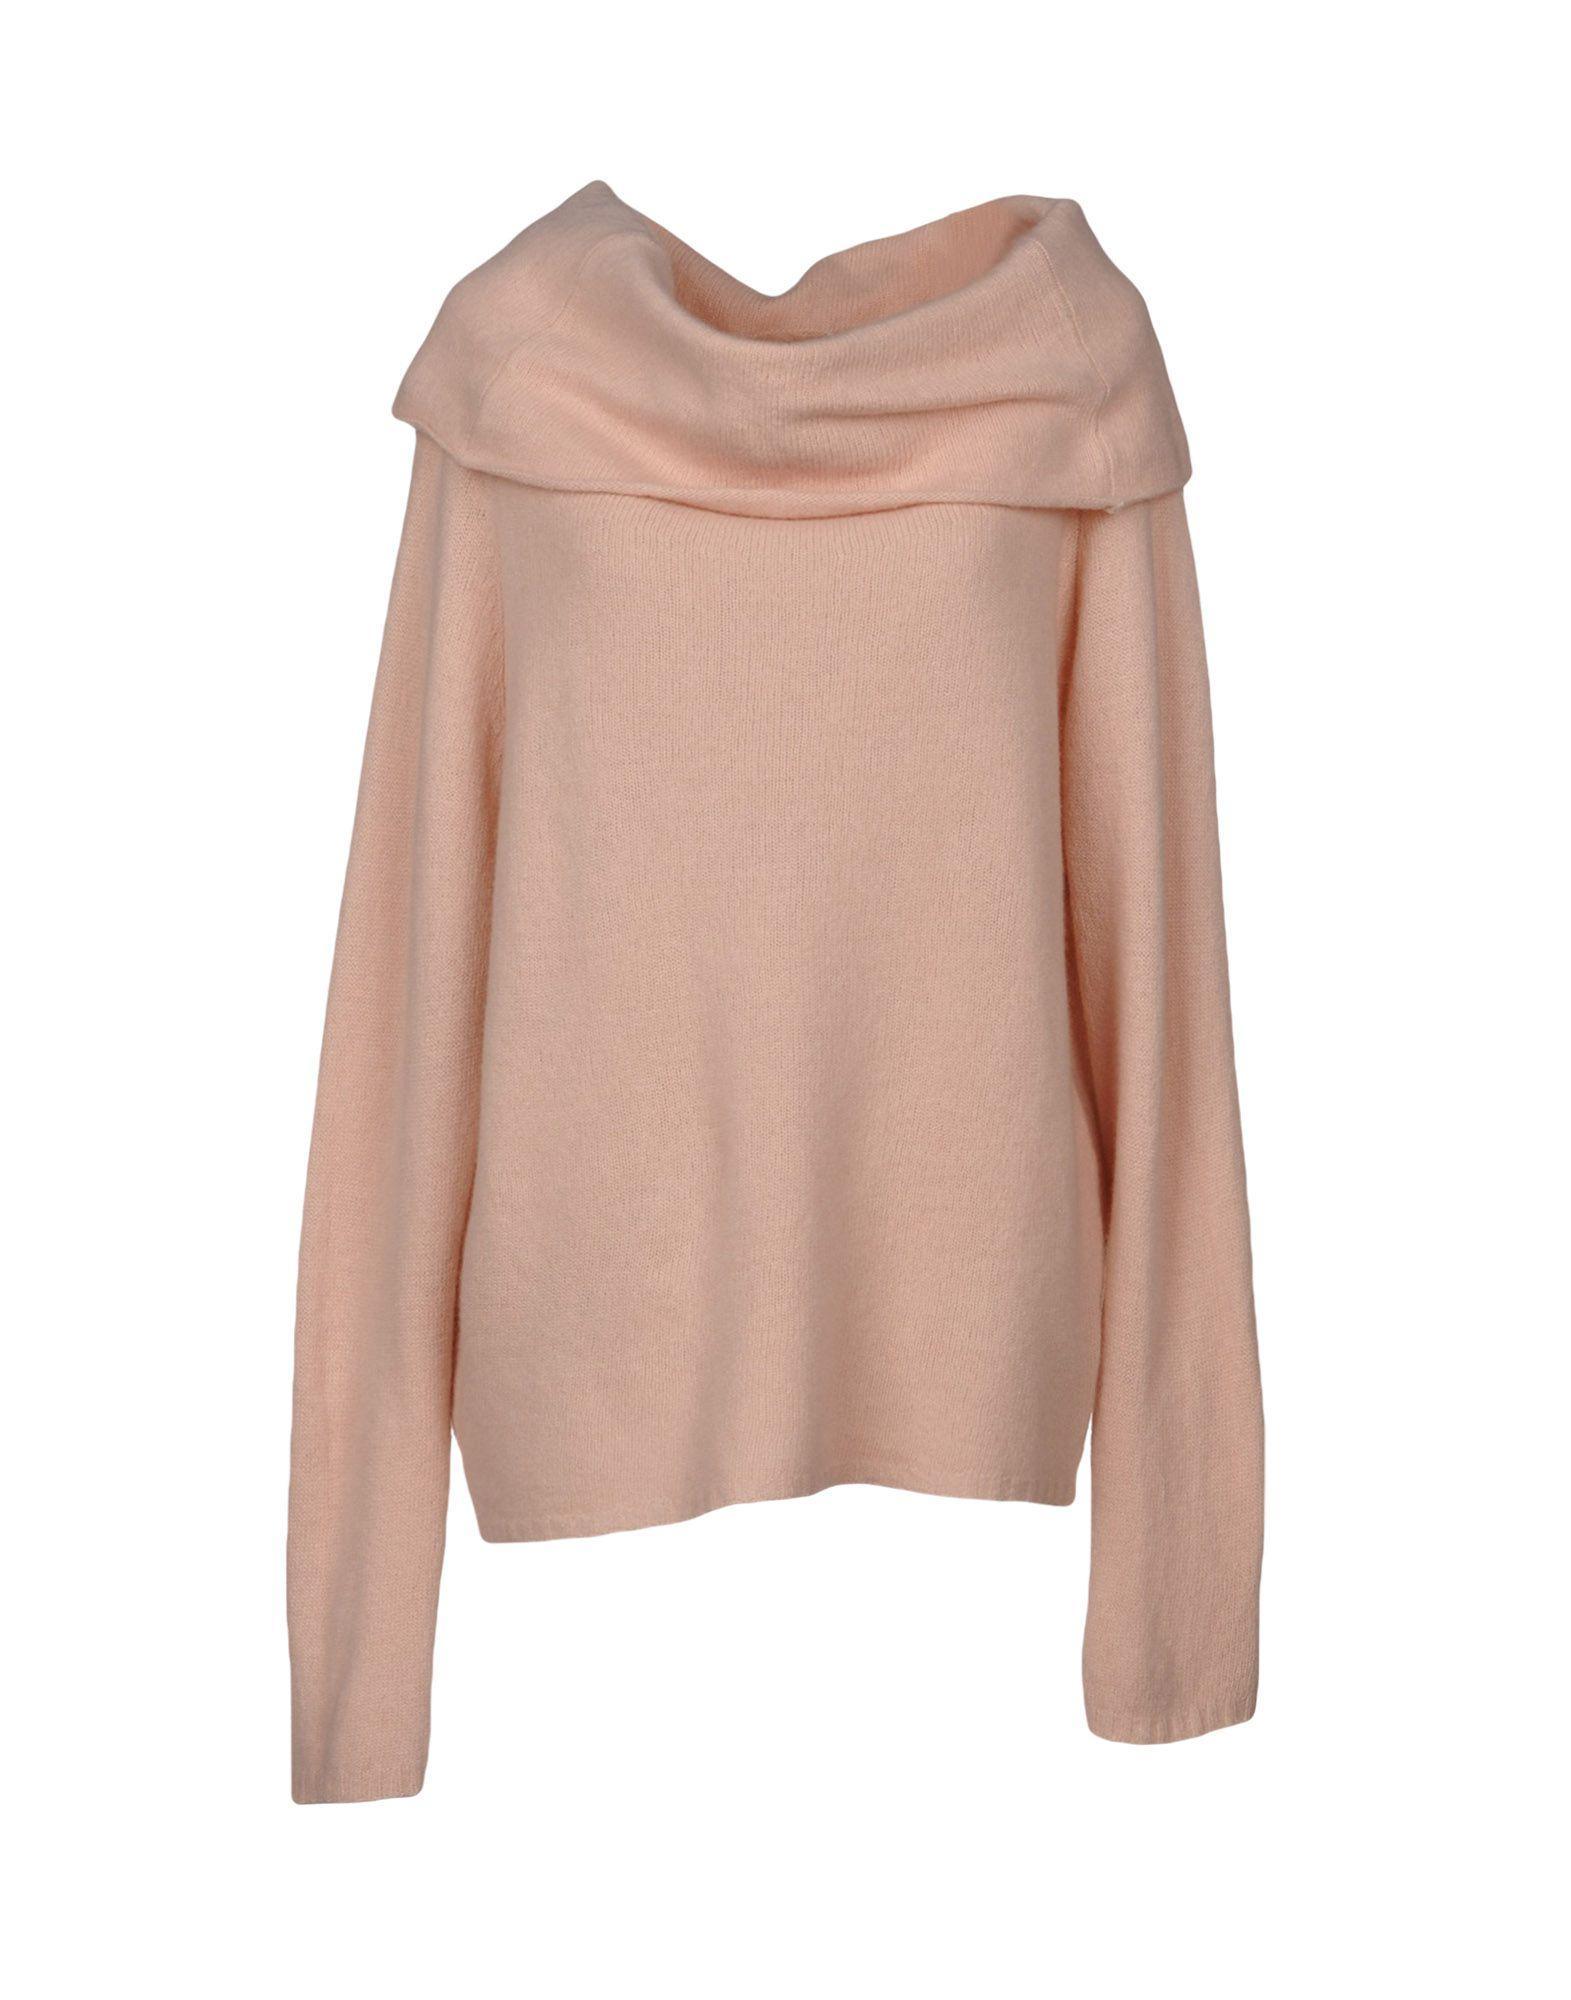 Barena Venezia Sweater In Pink